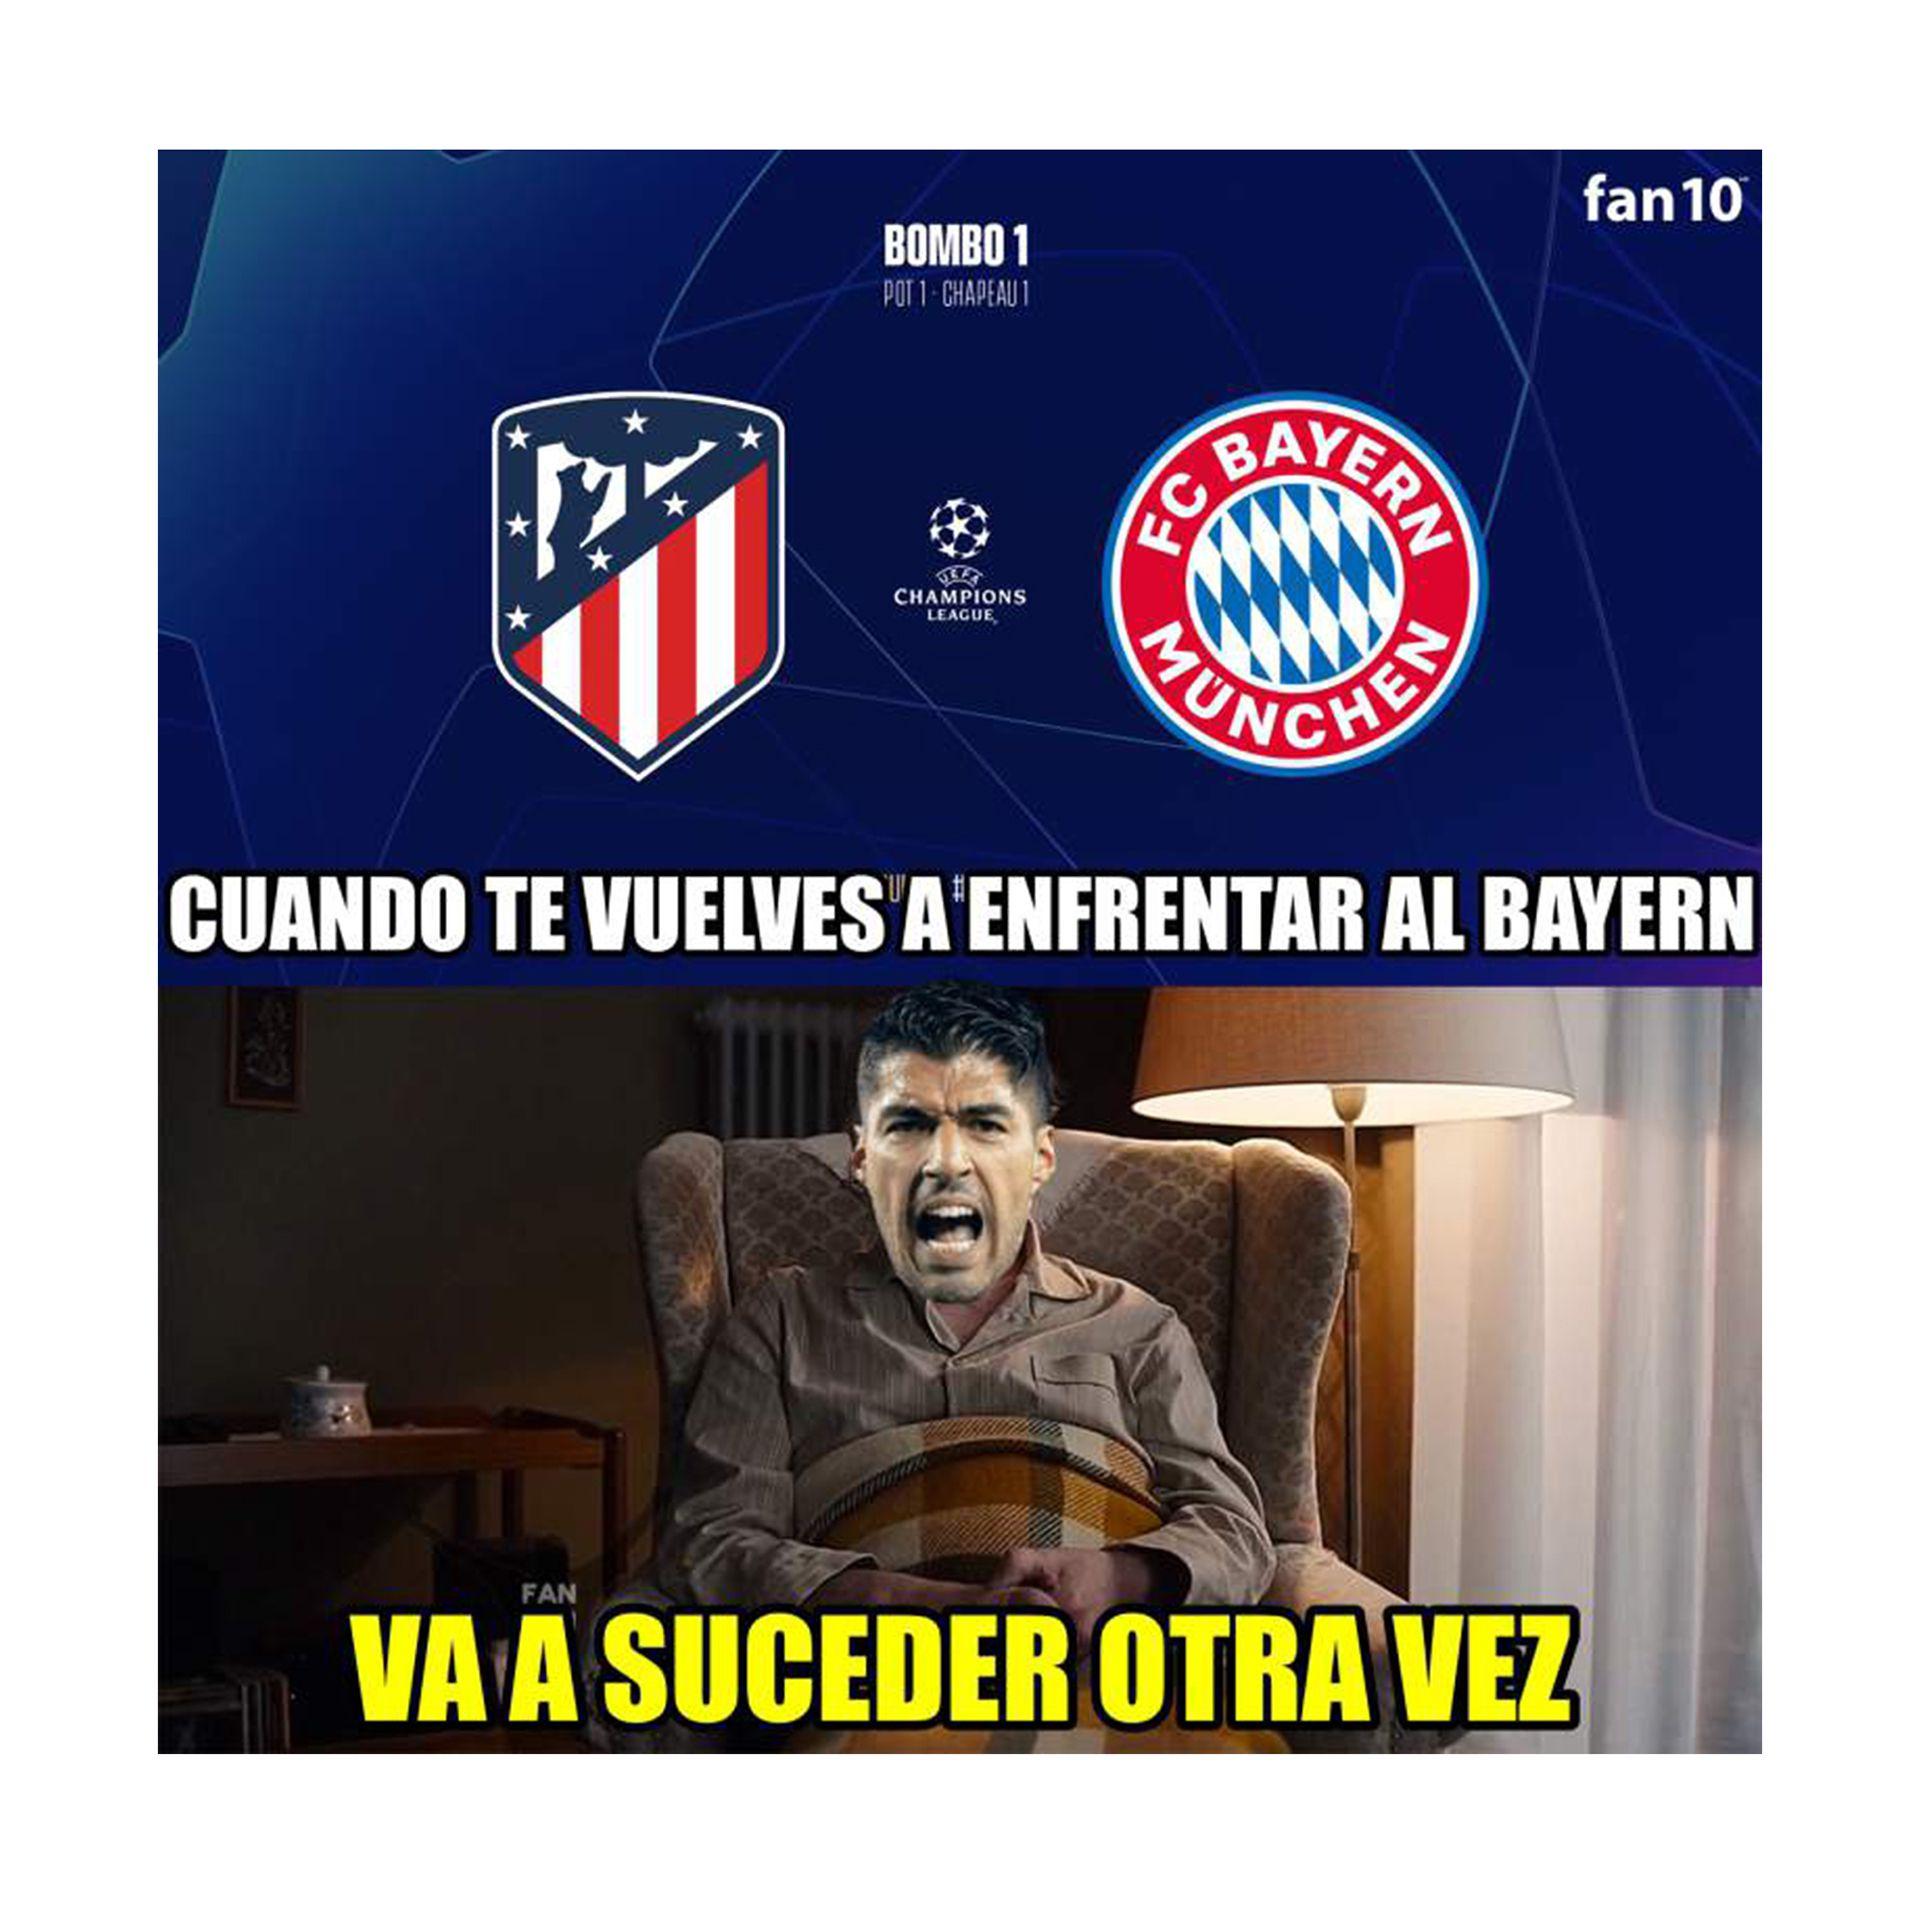 memes sobre la champions league